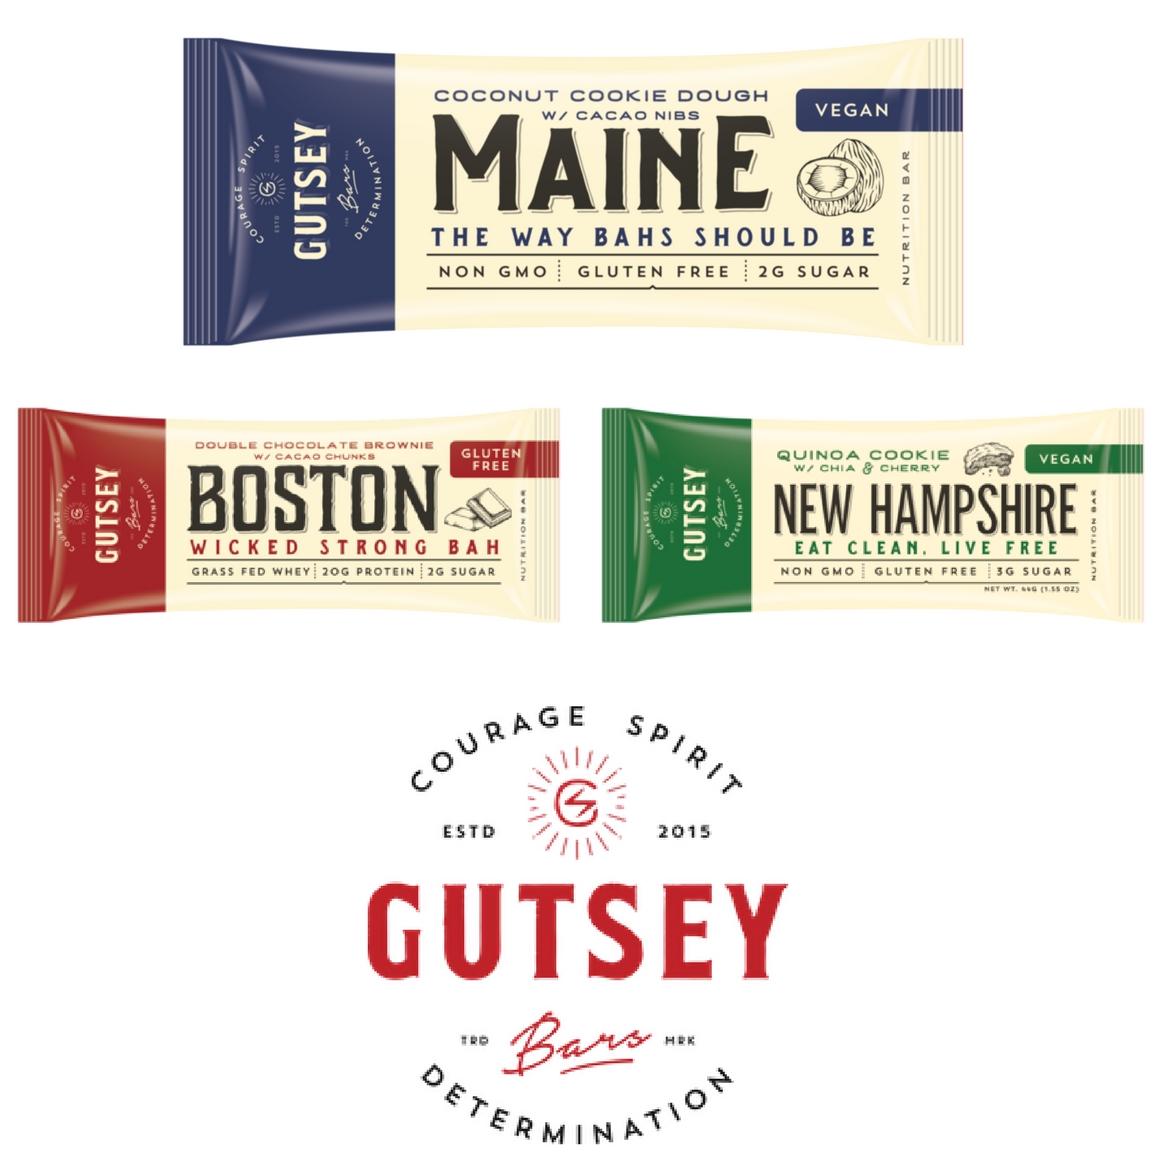 Gutsey Brand image (1).jpg